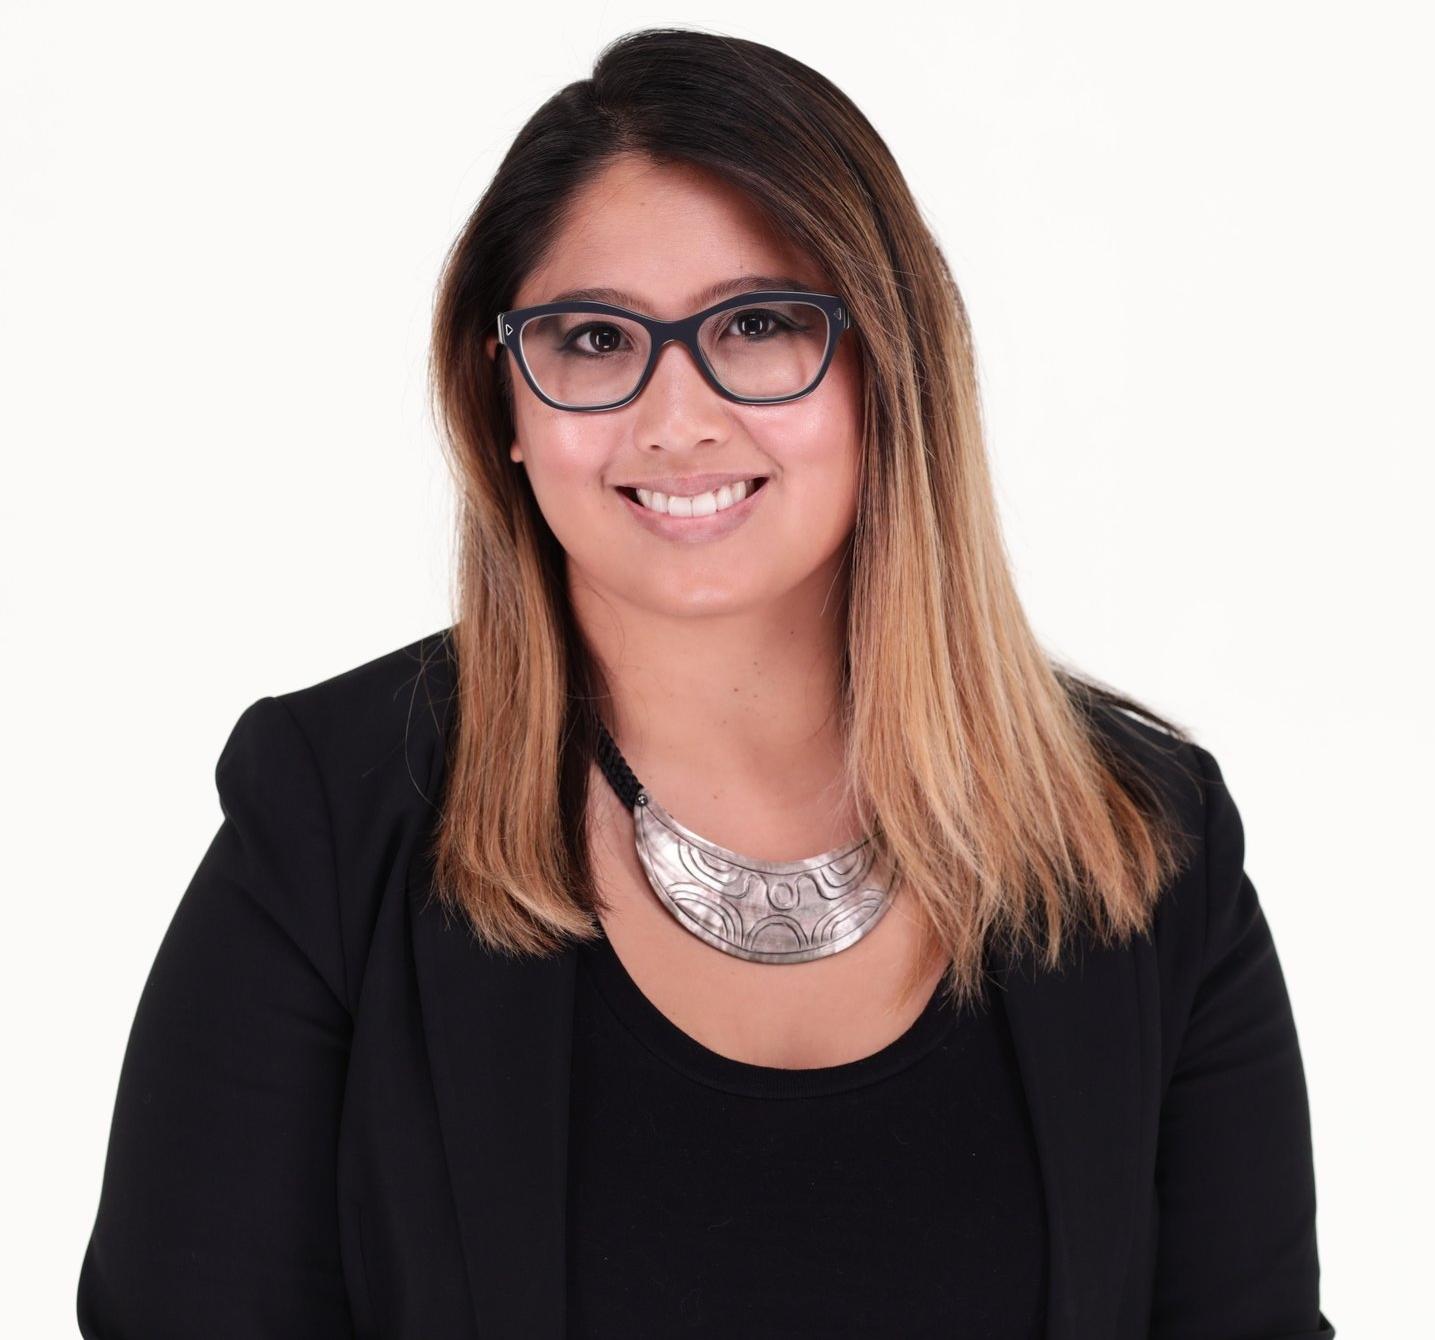 Hana Visaya | Senior Advertising Project Manager